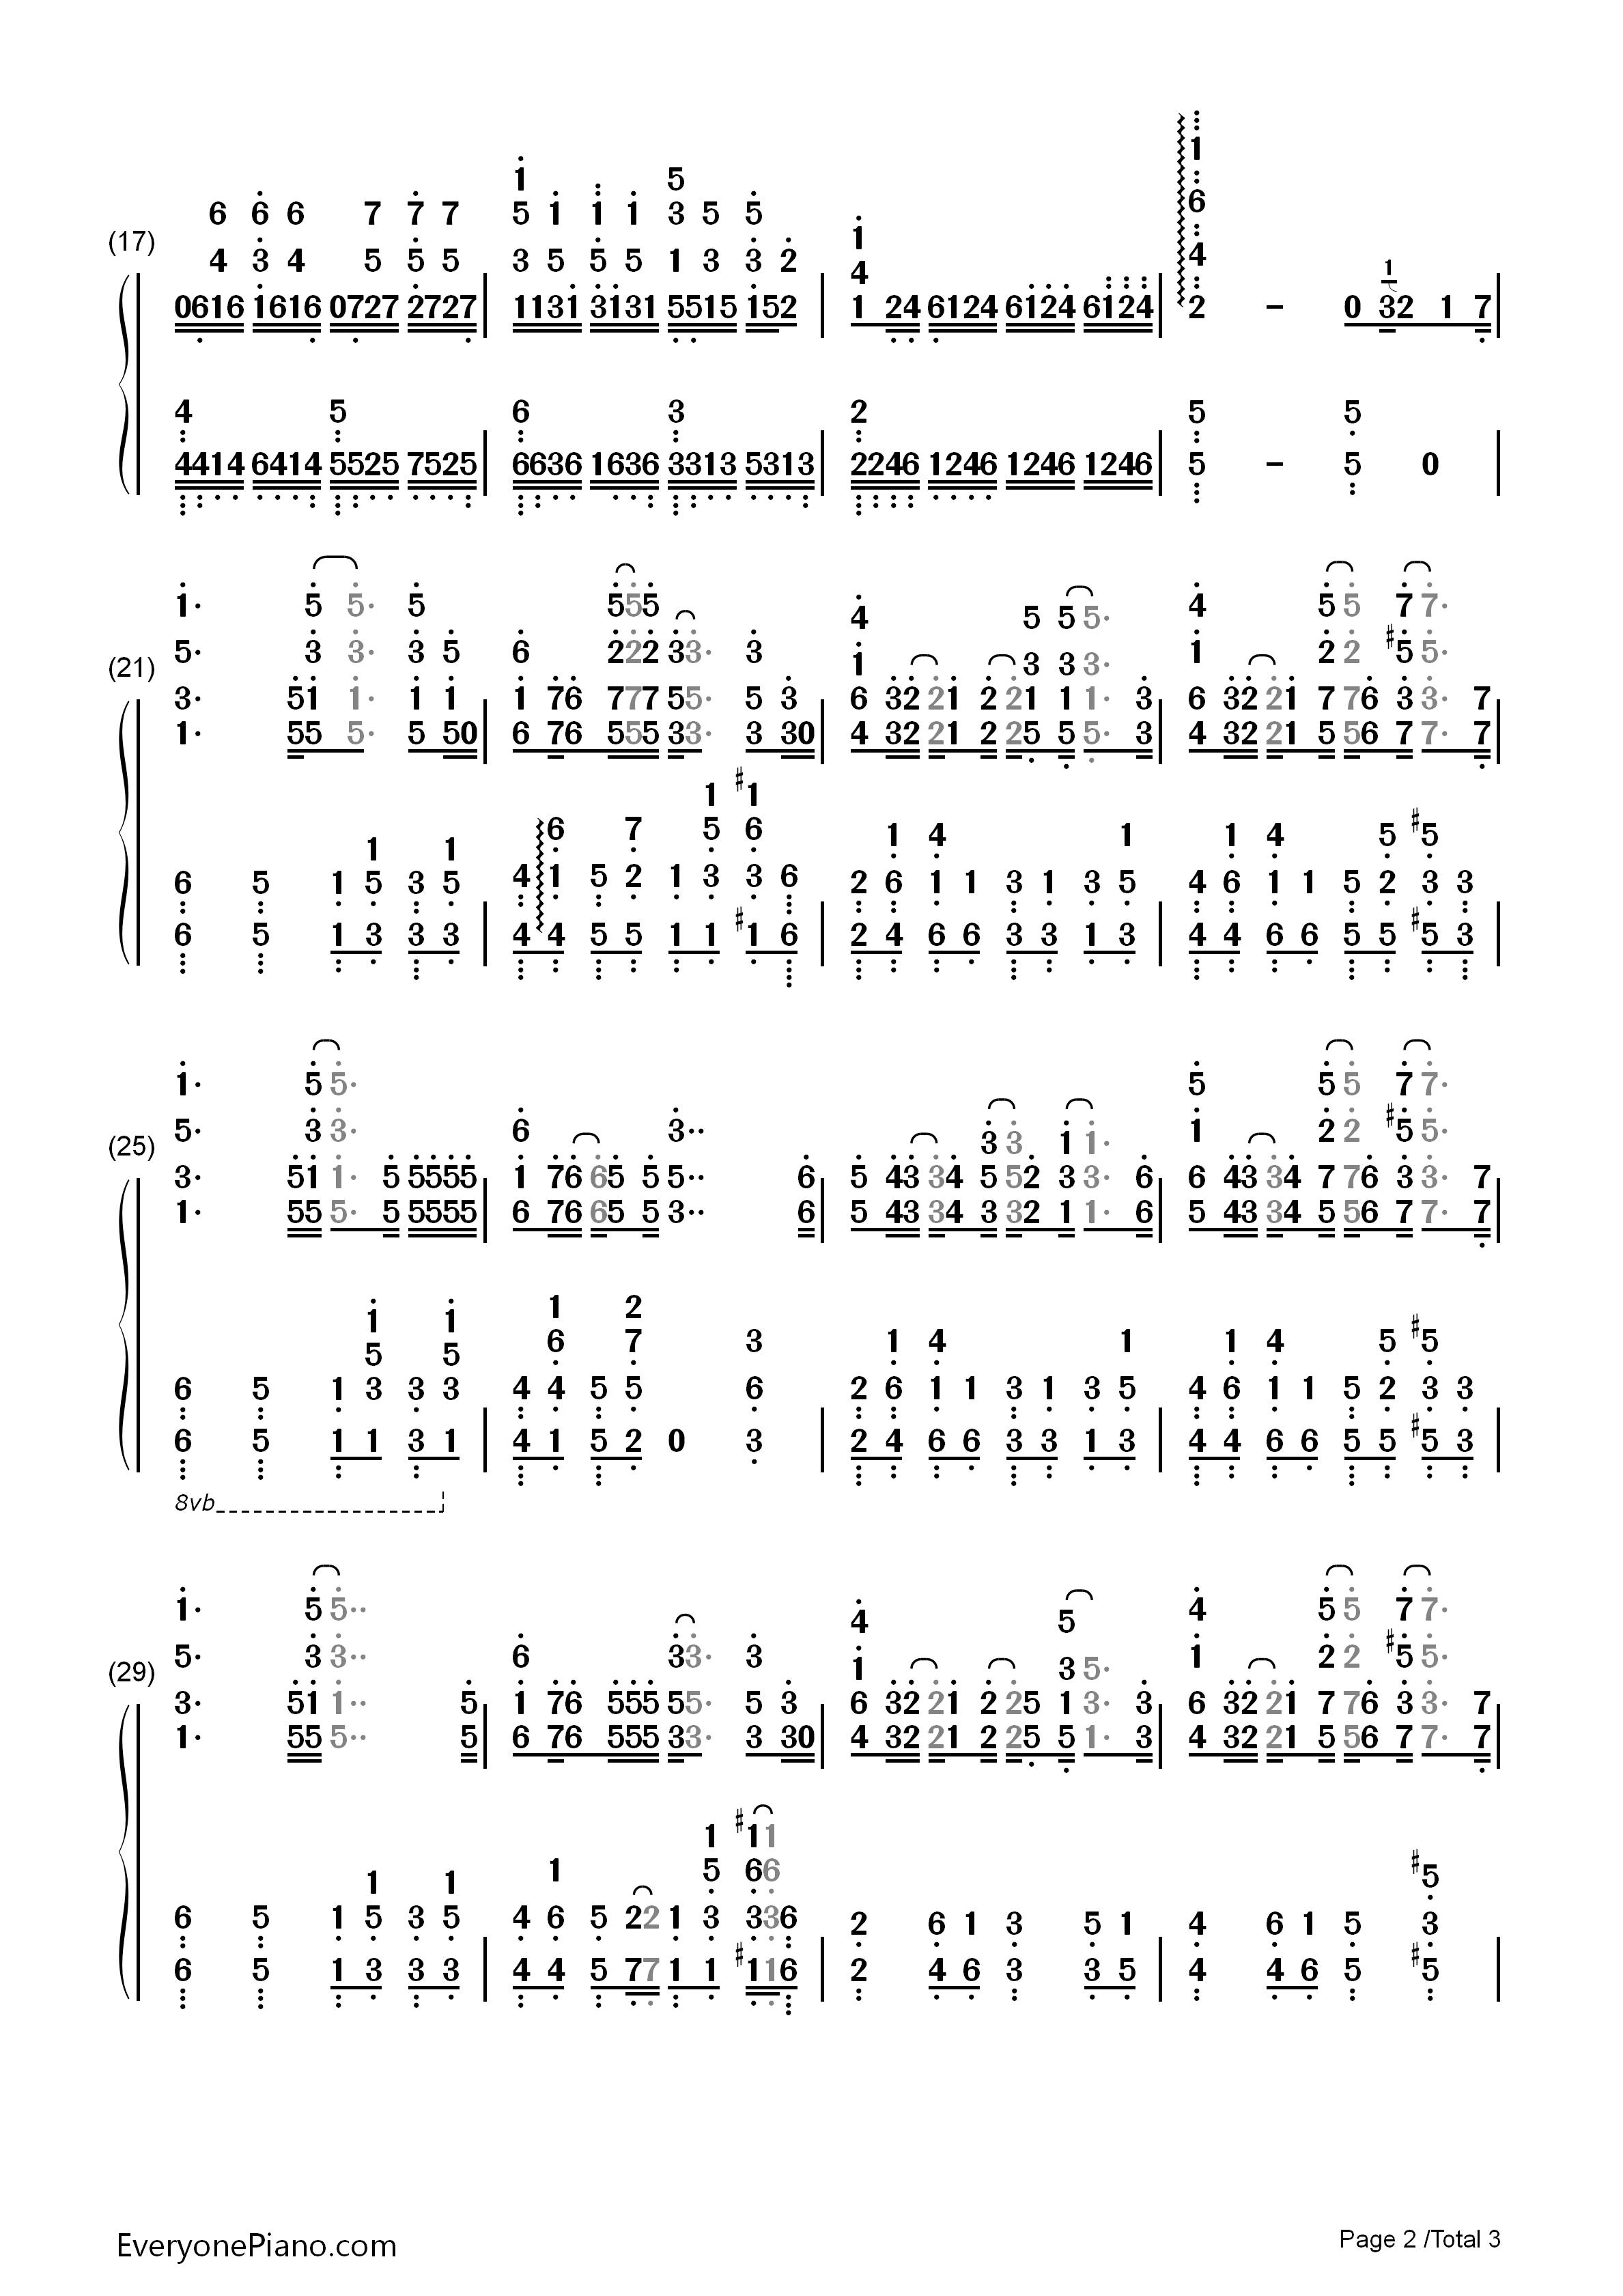 planetes-罪恶王冠:失落的圣诞节ova主题歌双手简谱2